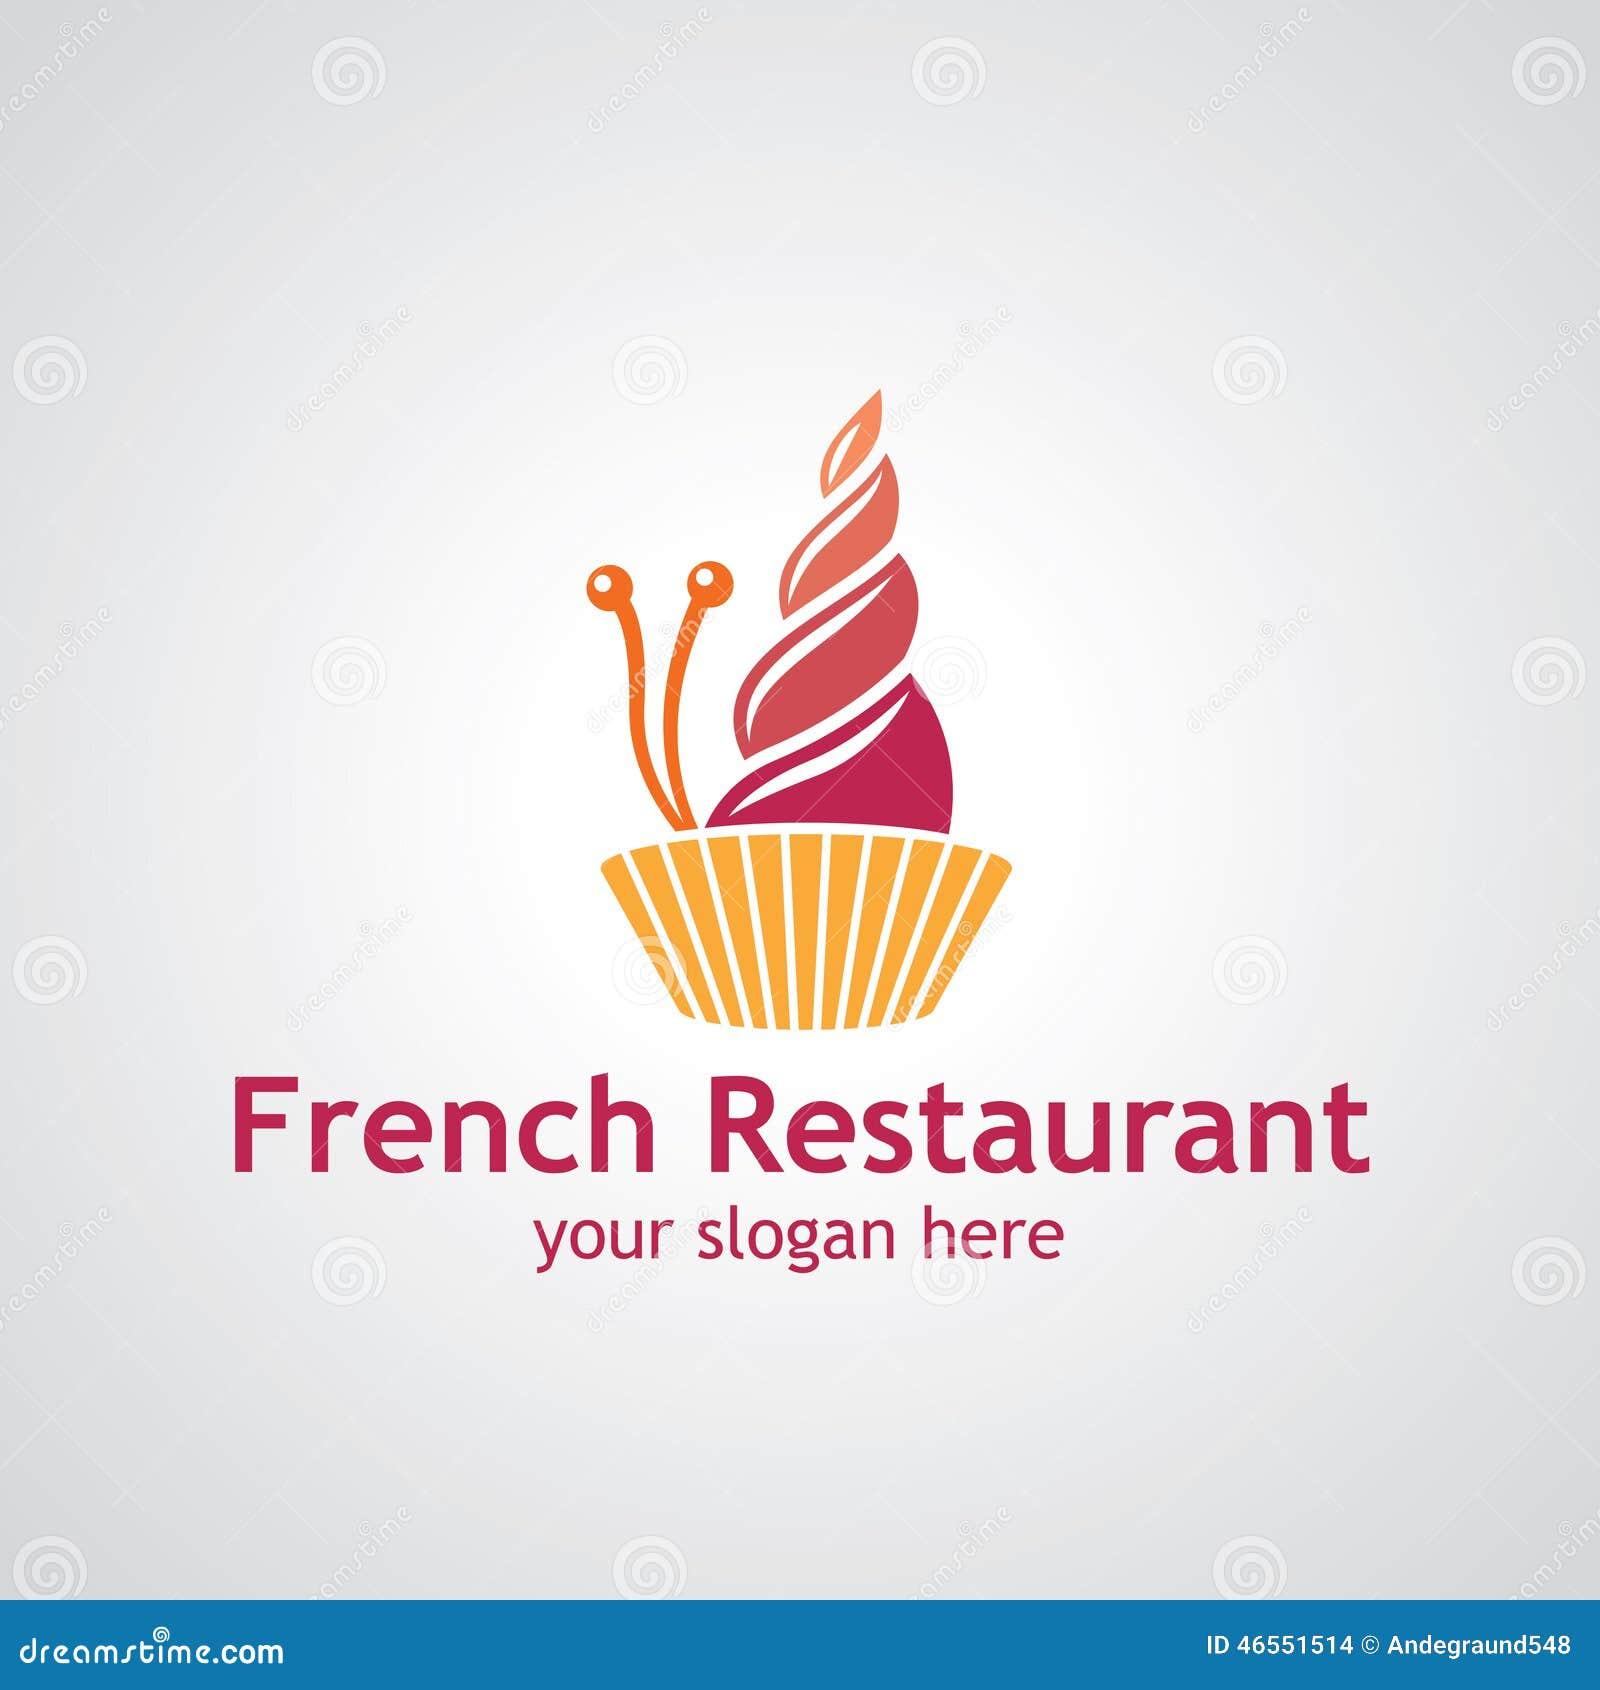 French Restaurant Vector Logo Design Stock Vector - Image ...